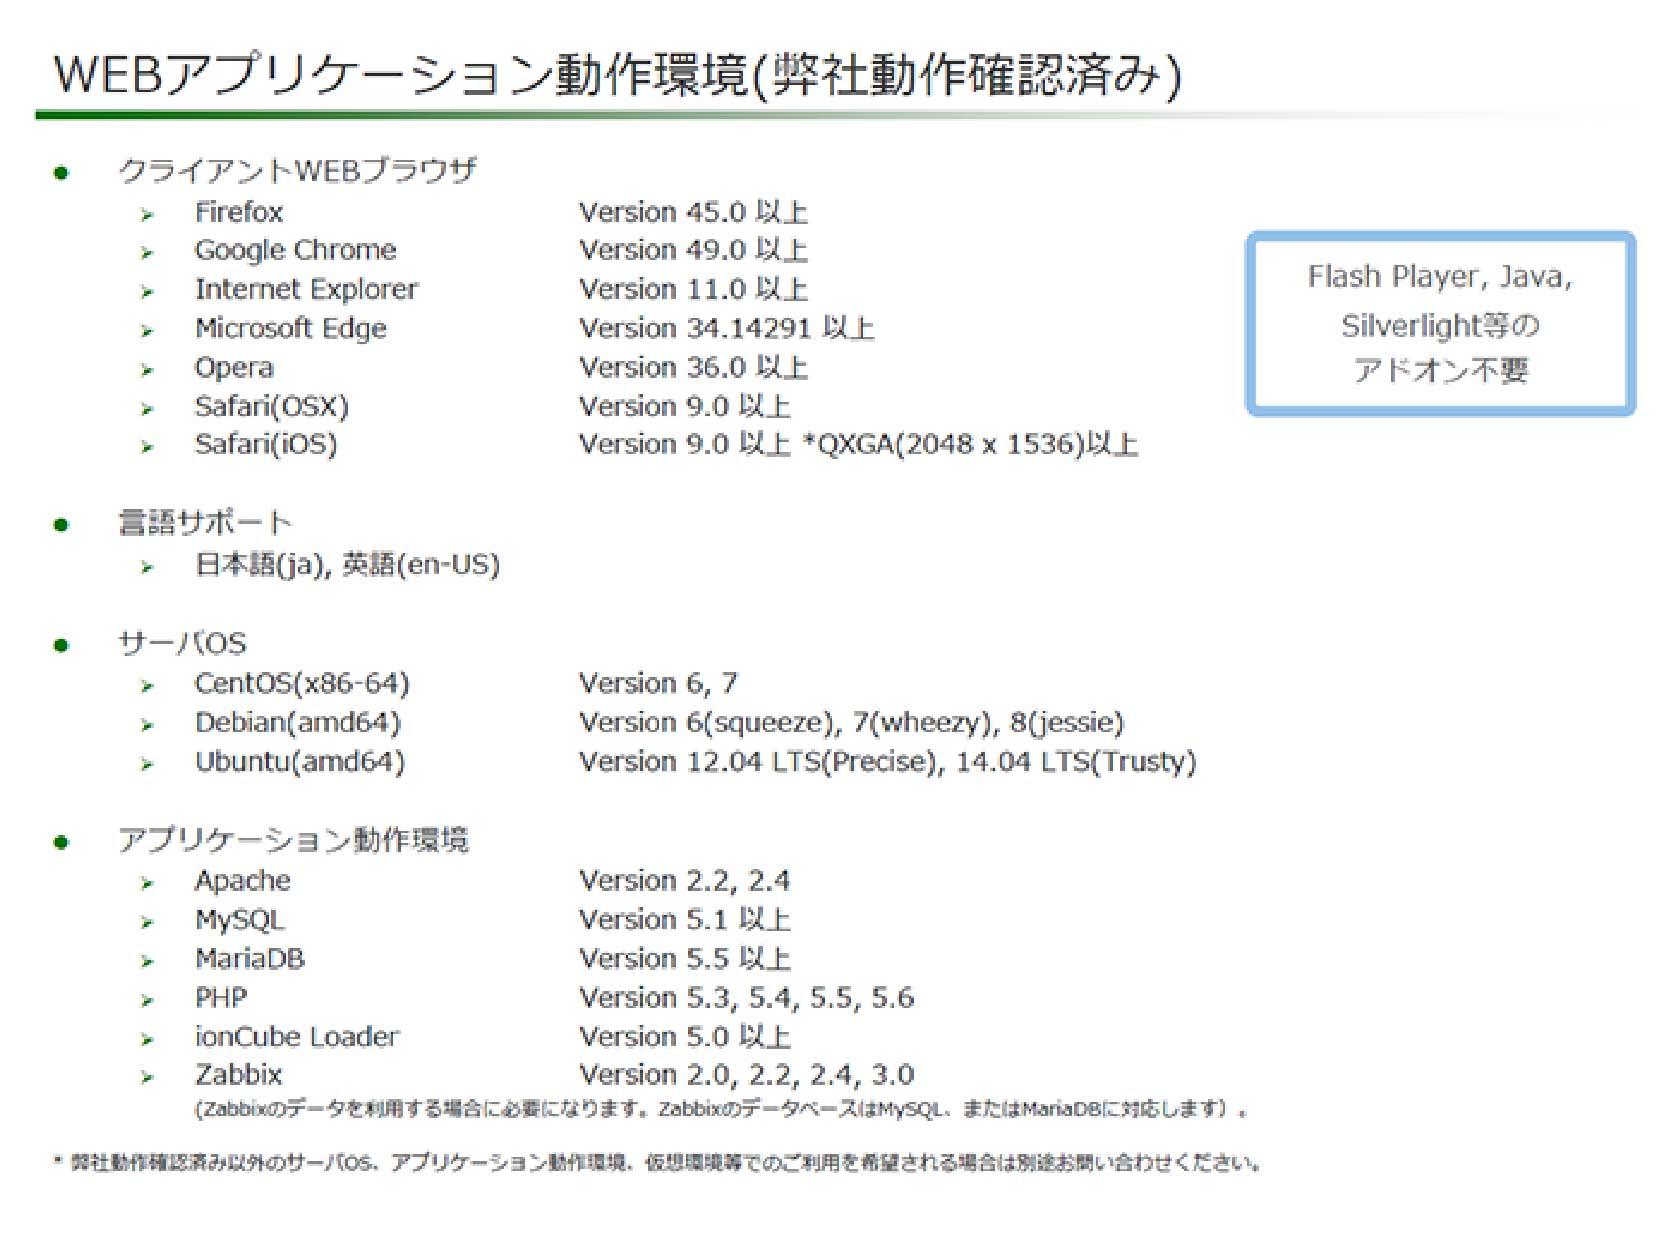 WEBアプリケーション動作環境(弊社動作確認済み)